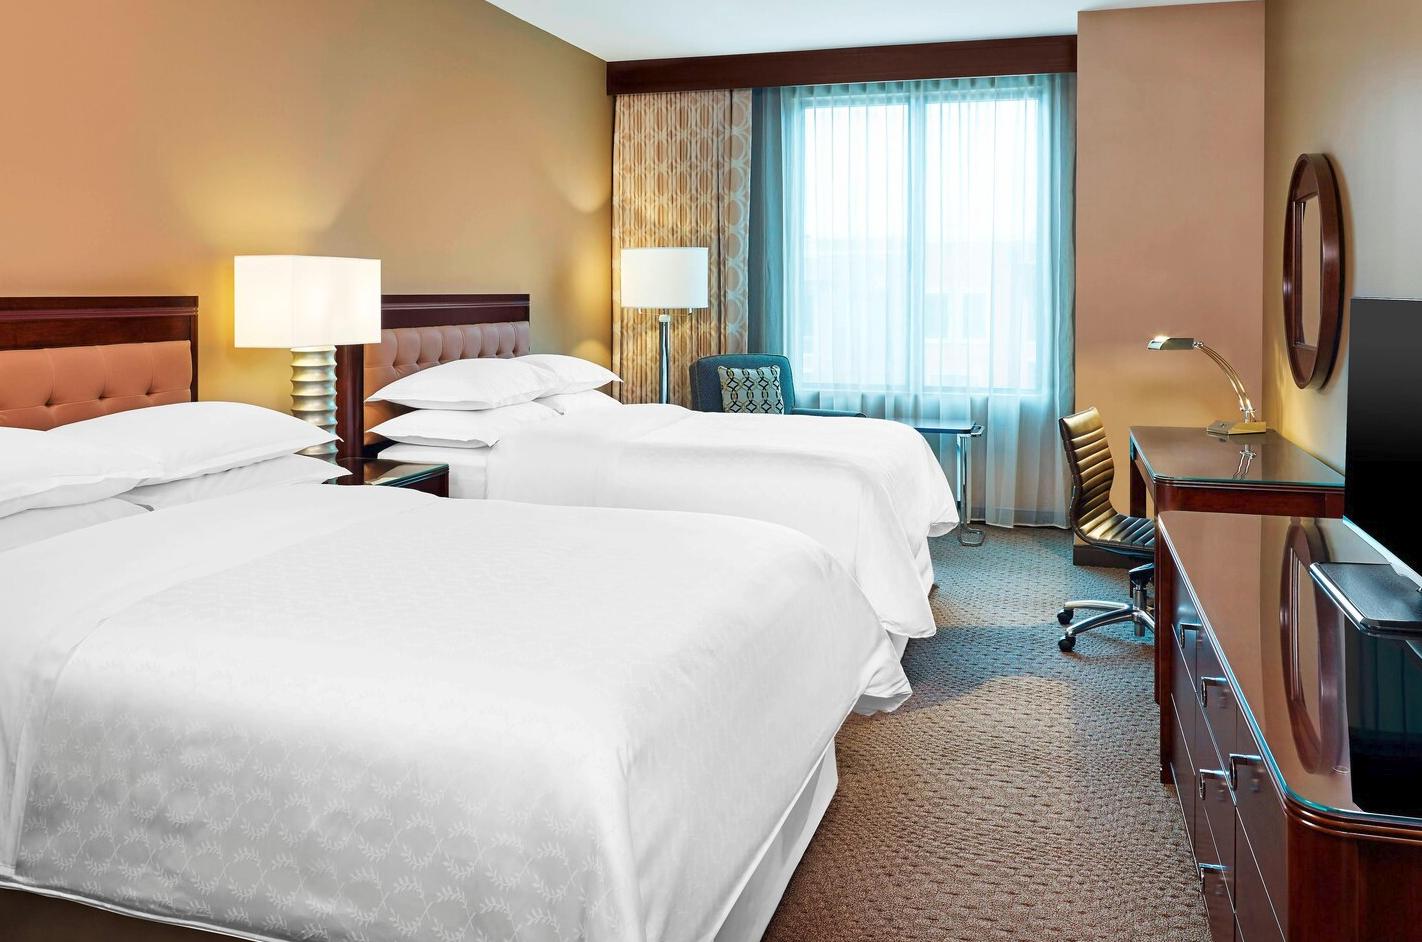 https://www.hotelsbyday.com/_data/default-hotel_image/3/16439/screenshot-2020-04-07-at-4-16-23-pm.png